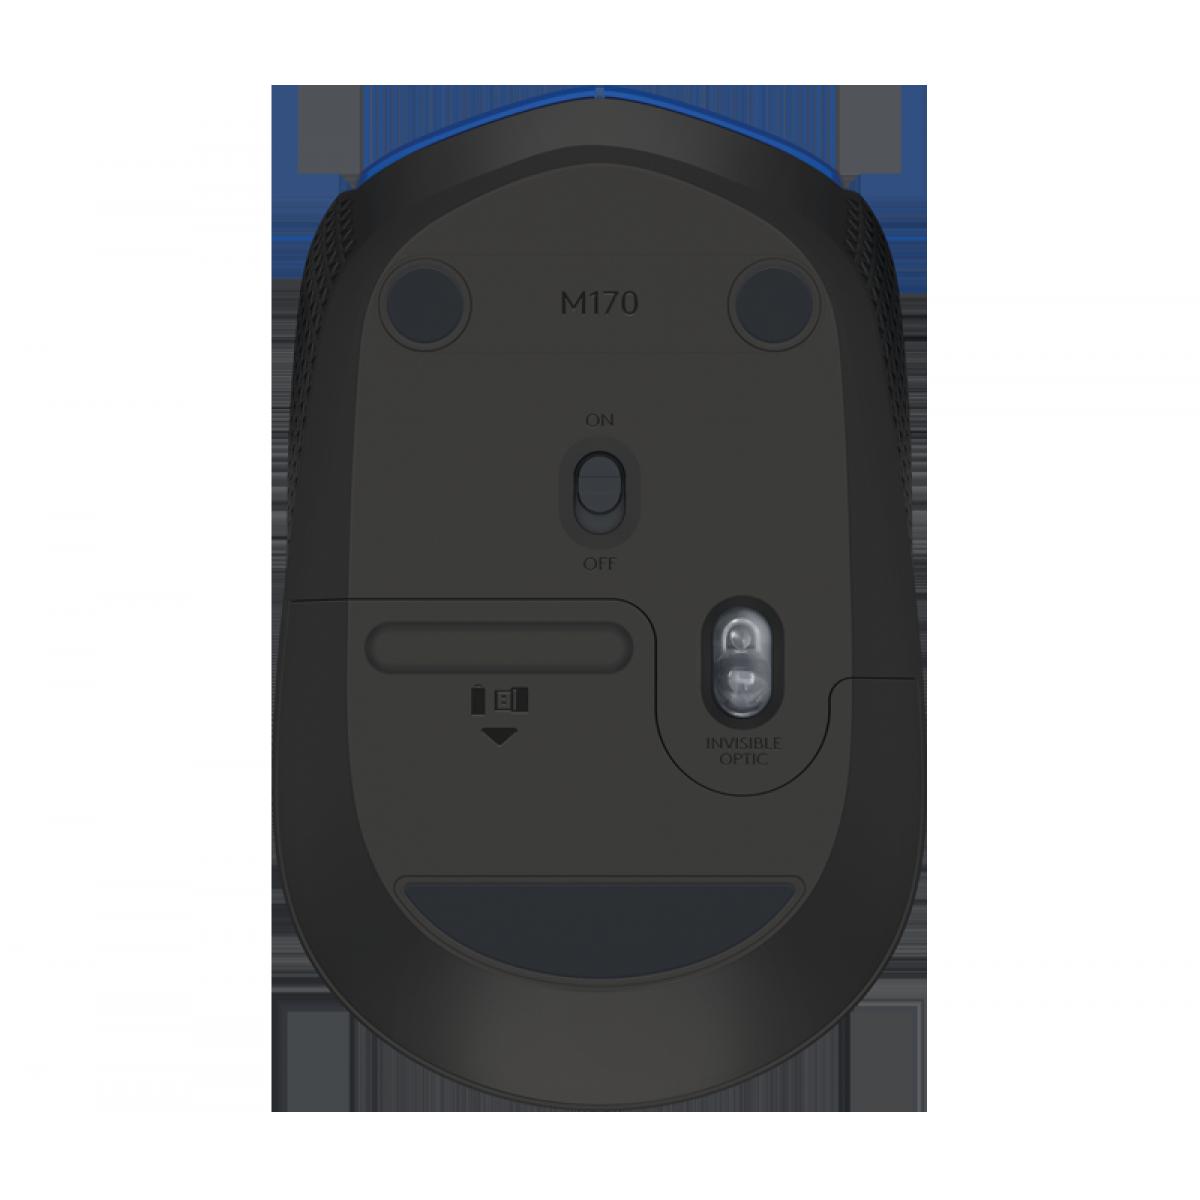 Mouse Logitech, M170 Wireless, Blue, 910-004800